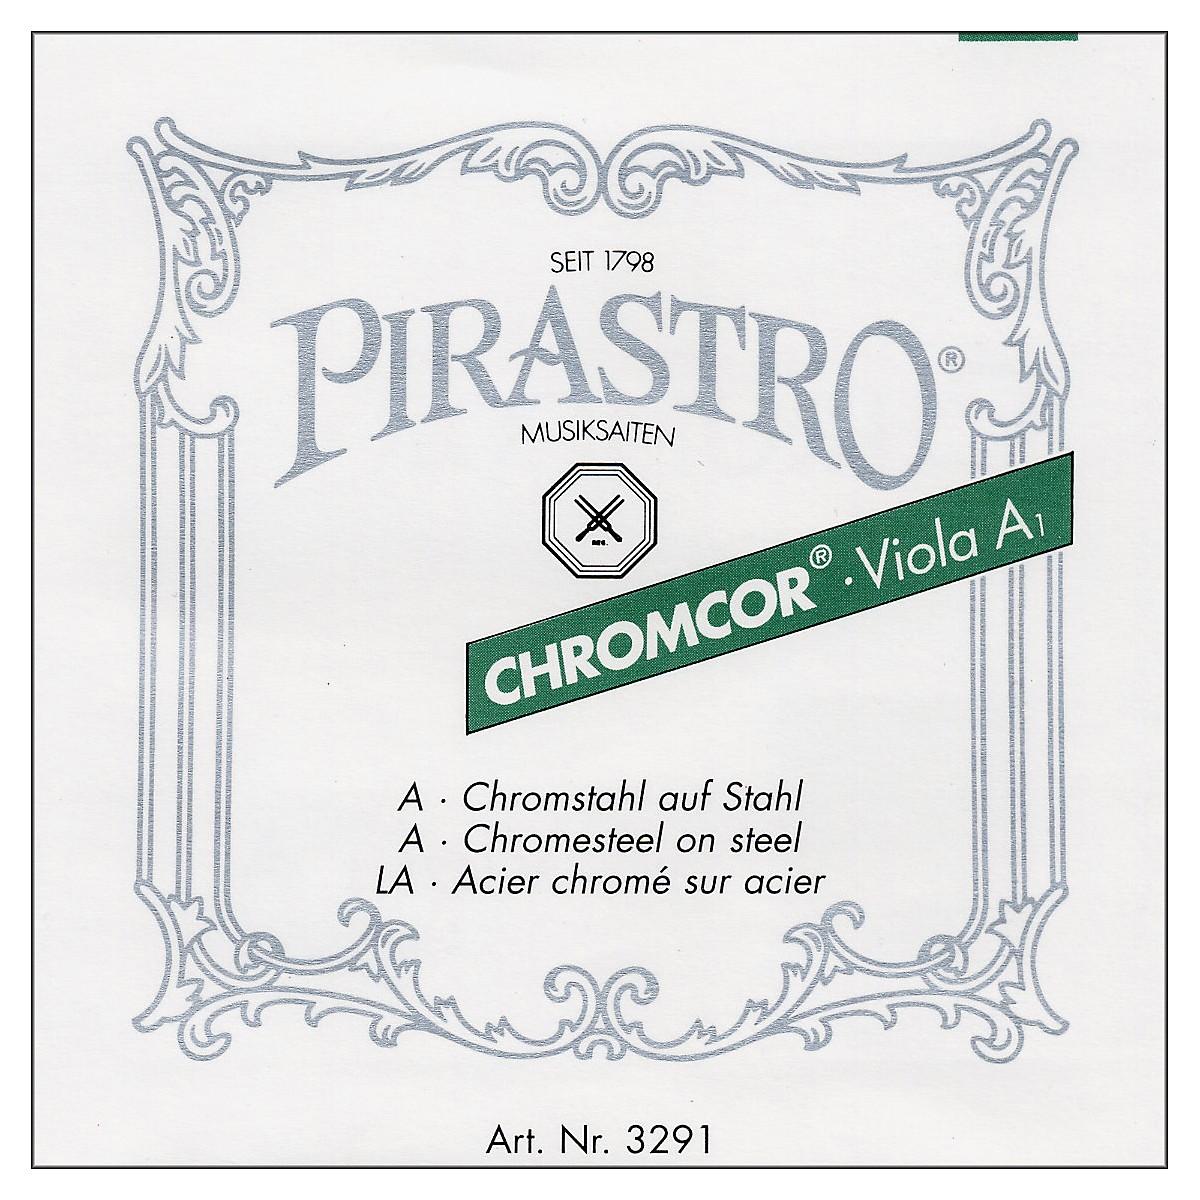 Pirastro Chromcor Series Viola A String